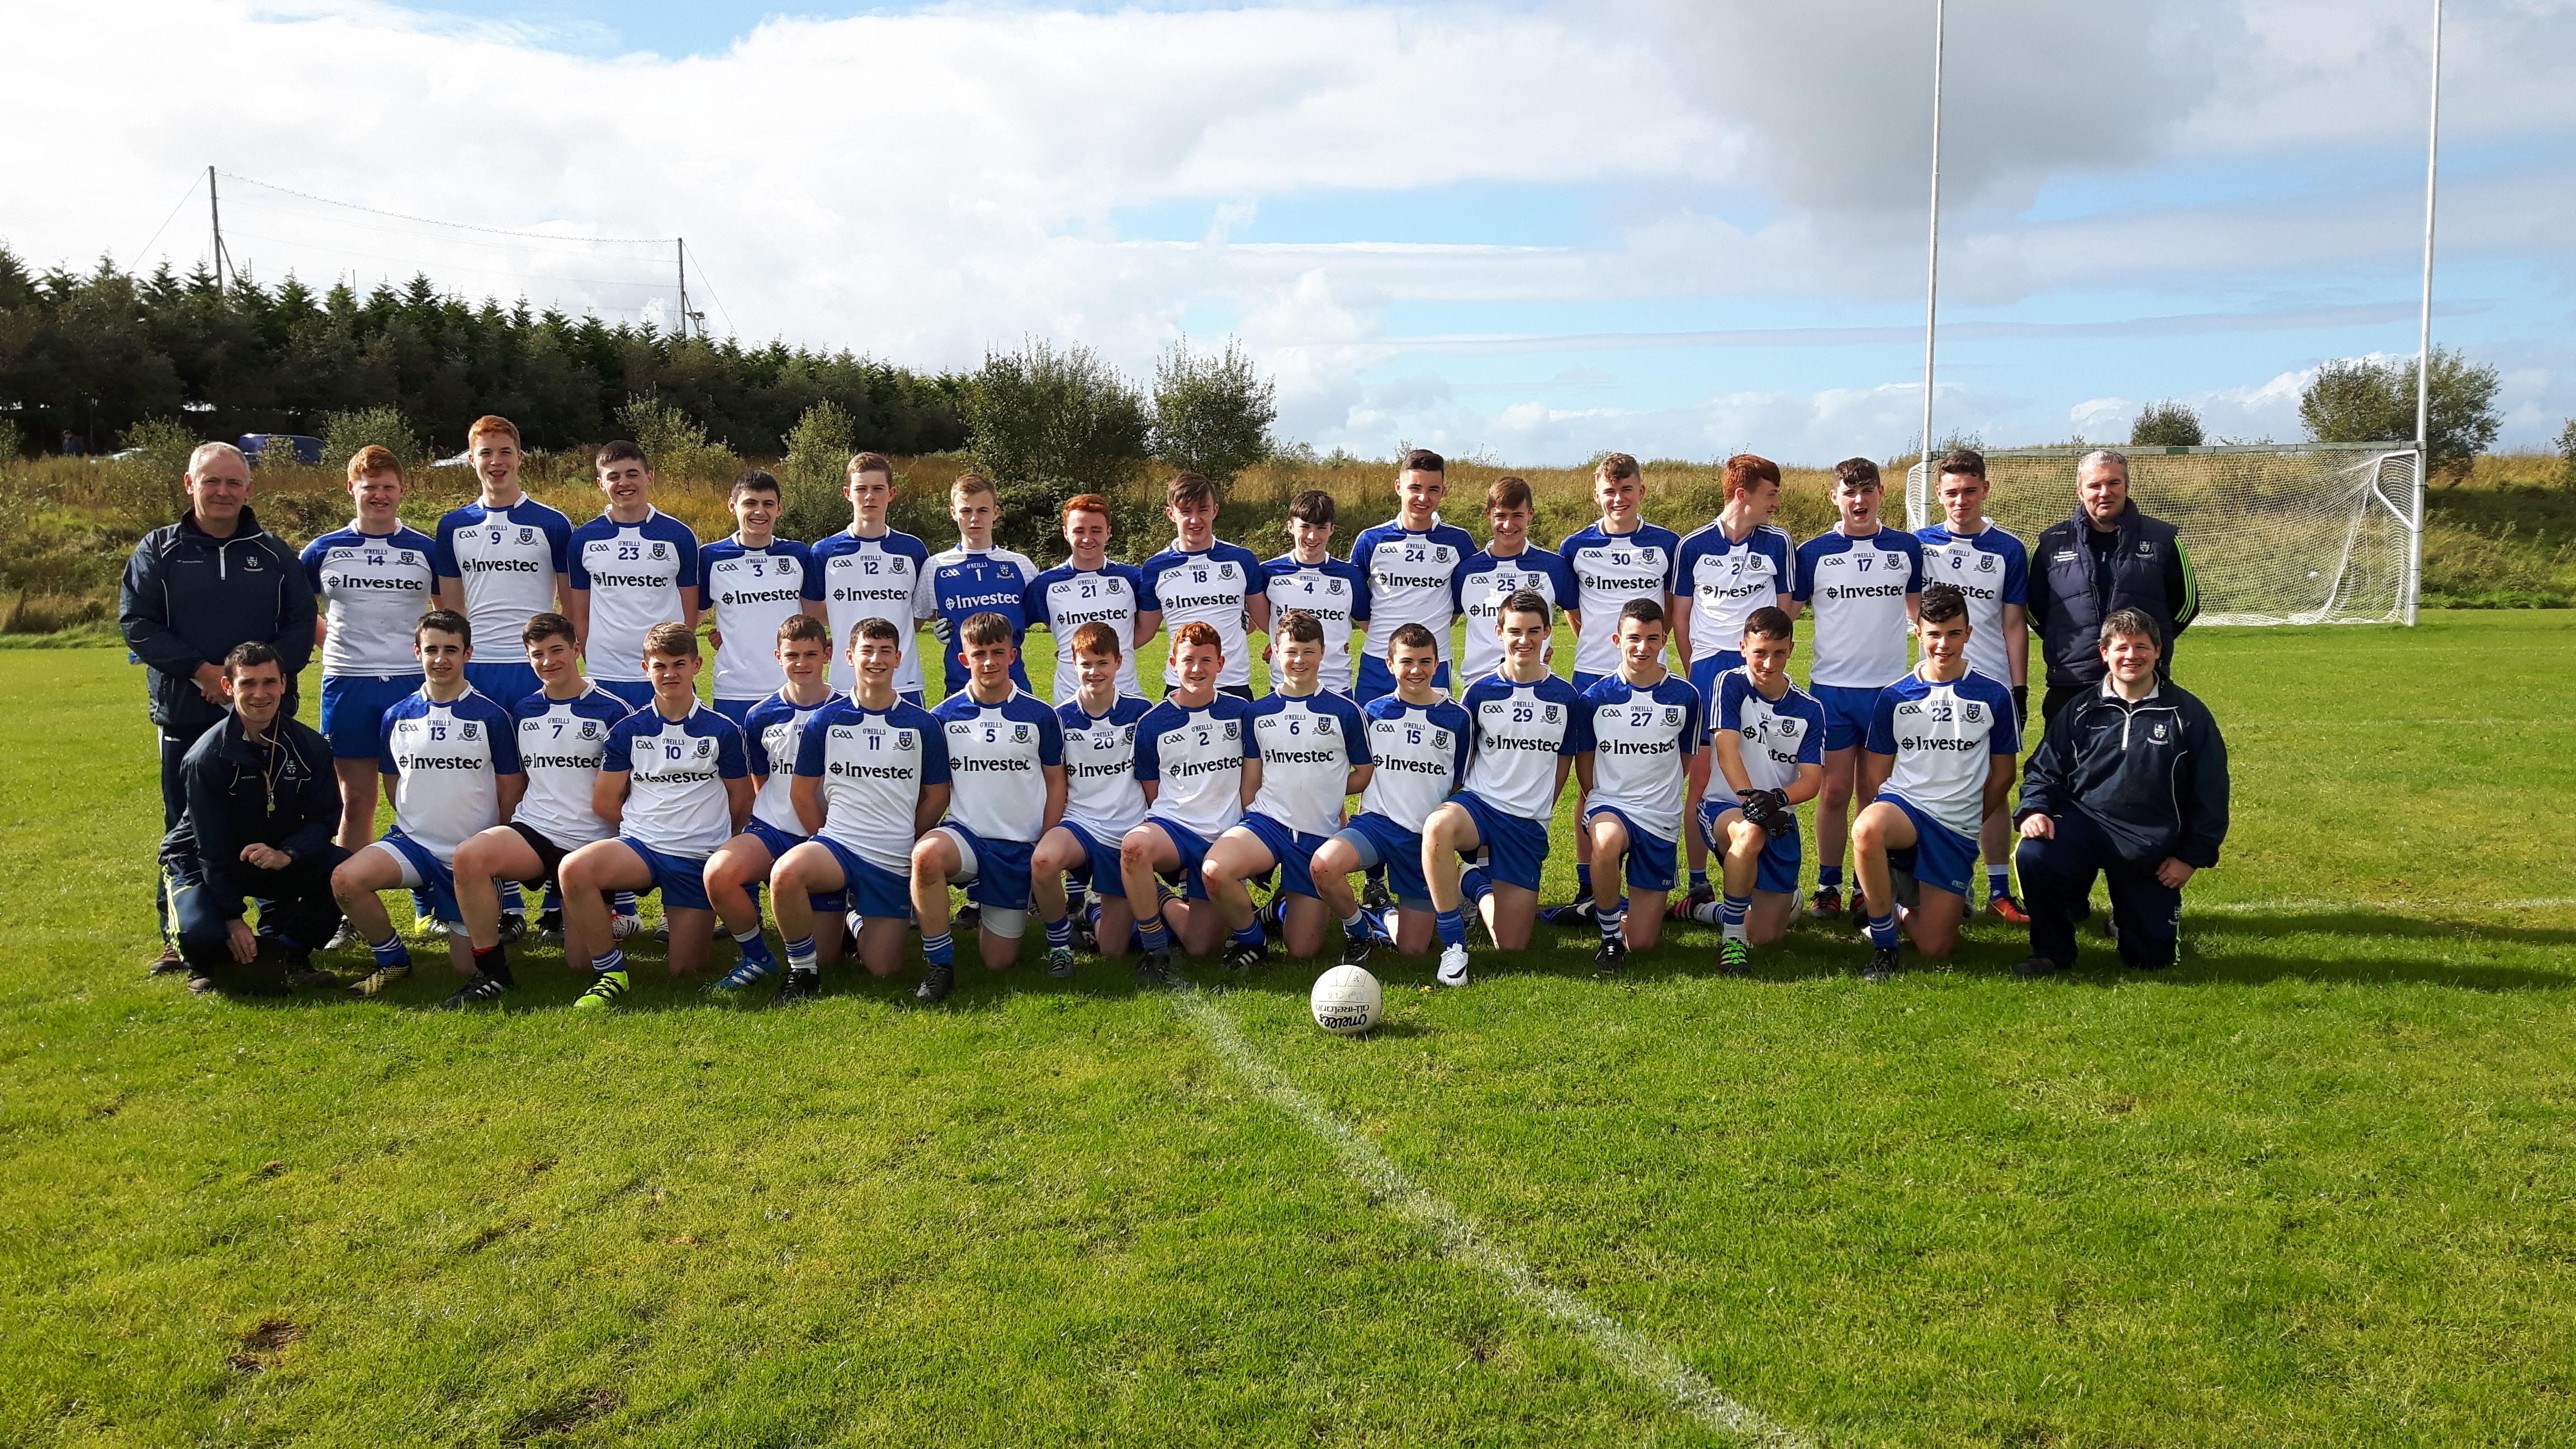 U15 Football Development Squad take part in Ulster Blitz